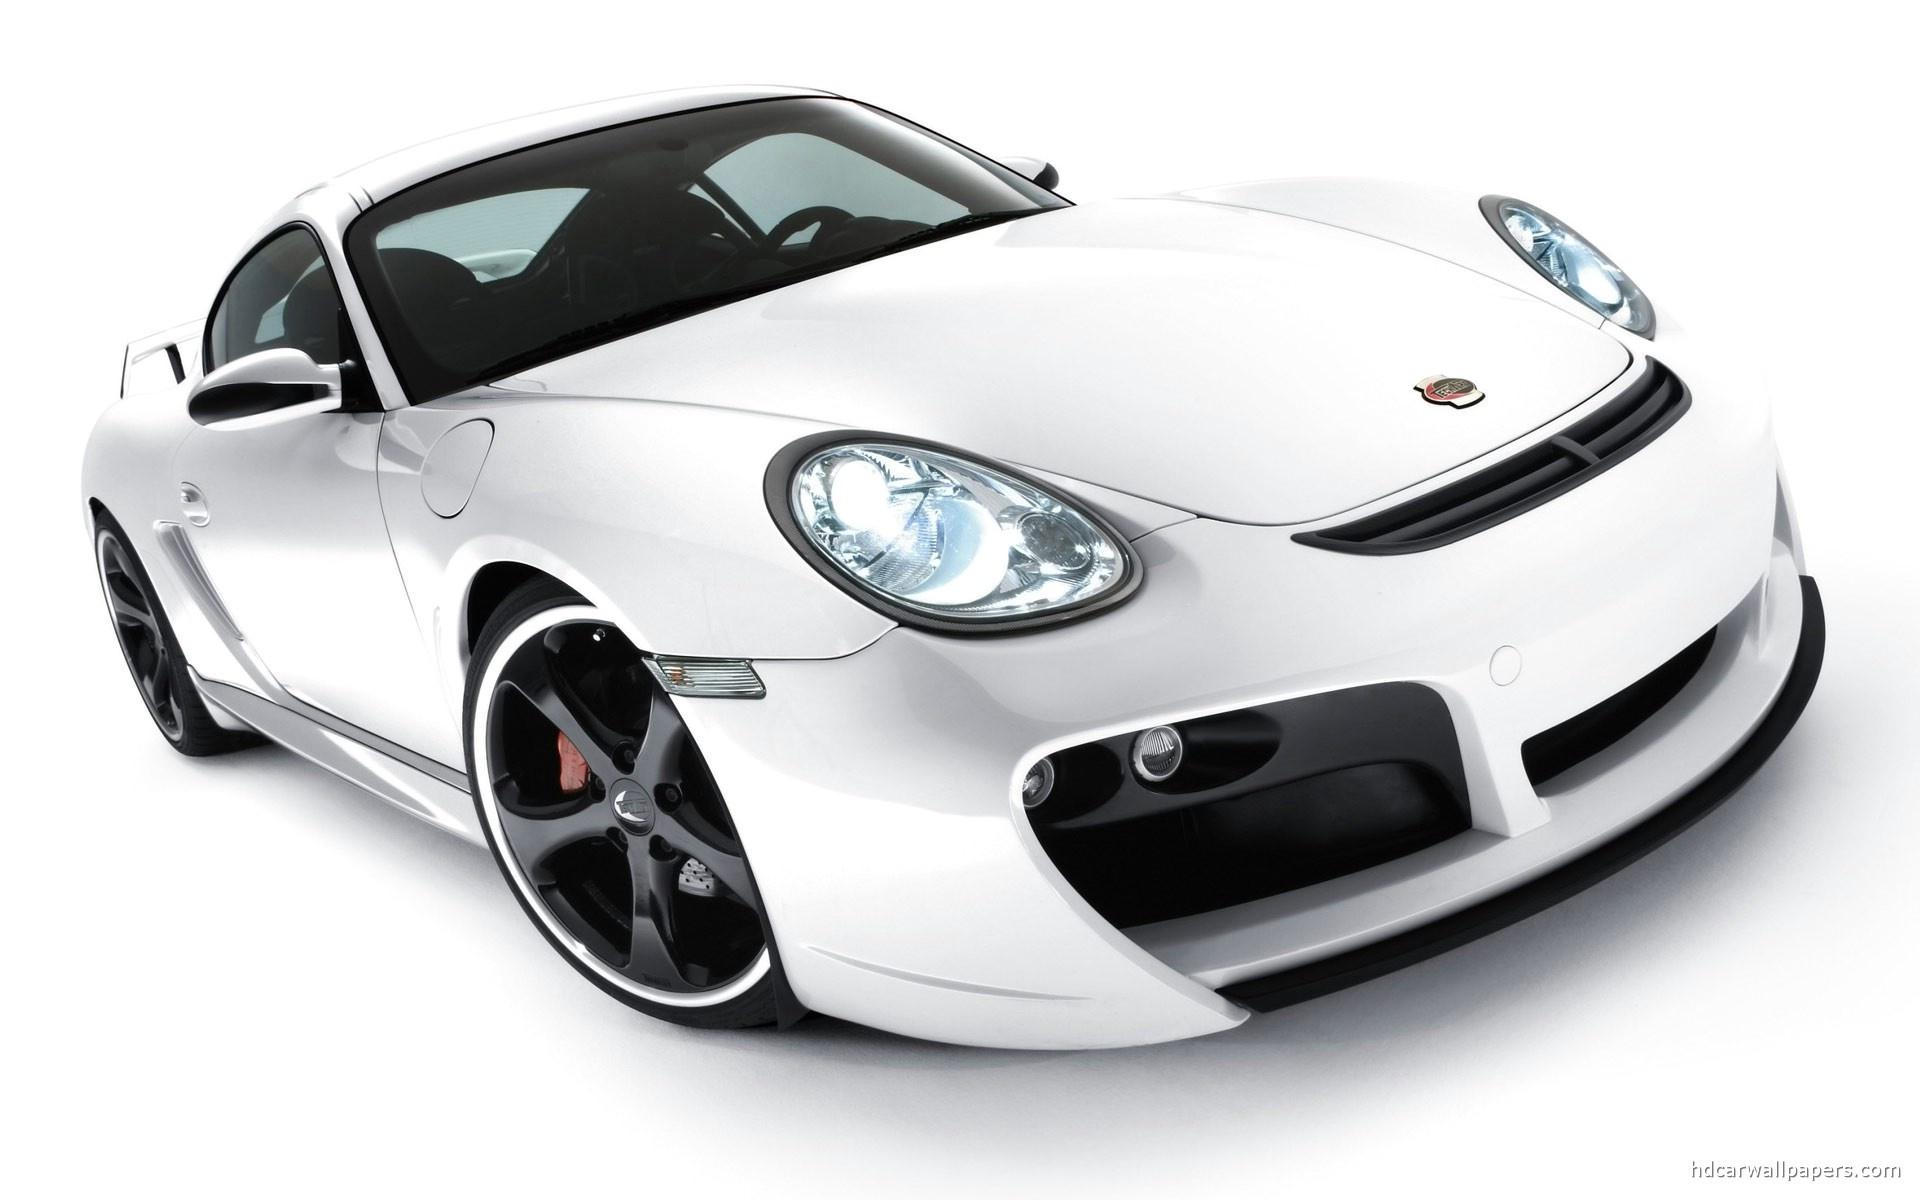 Porsche Cayman Techart Wallpapers In Jpg Format For Free Download